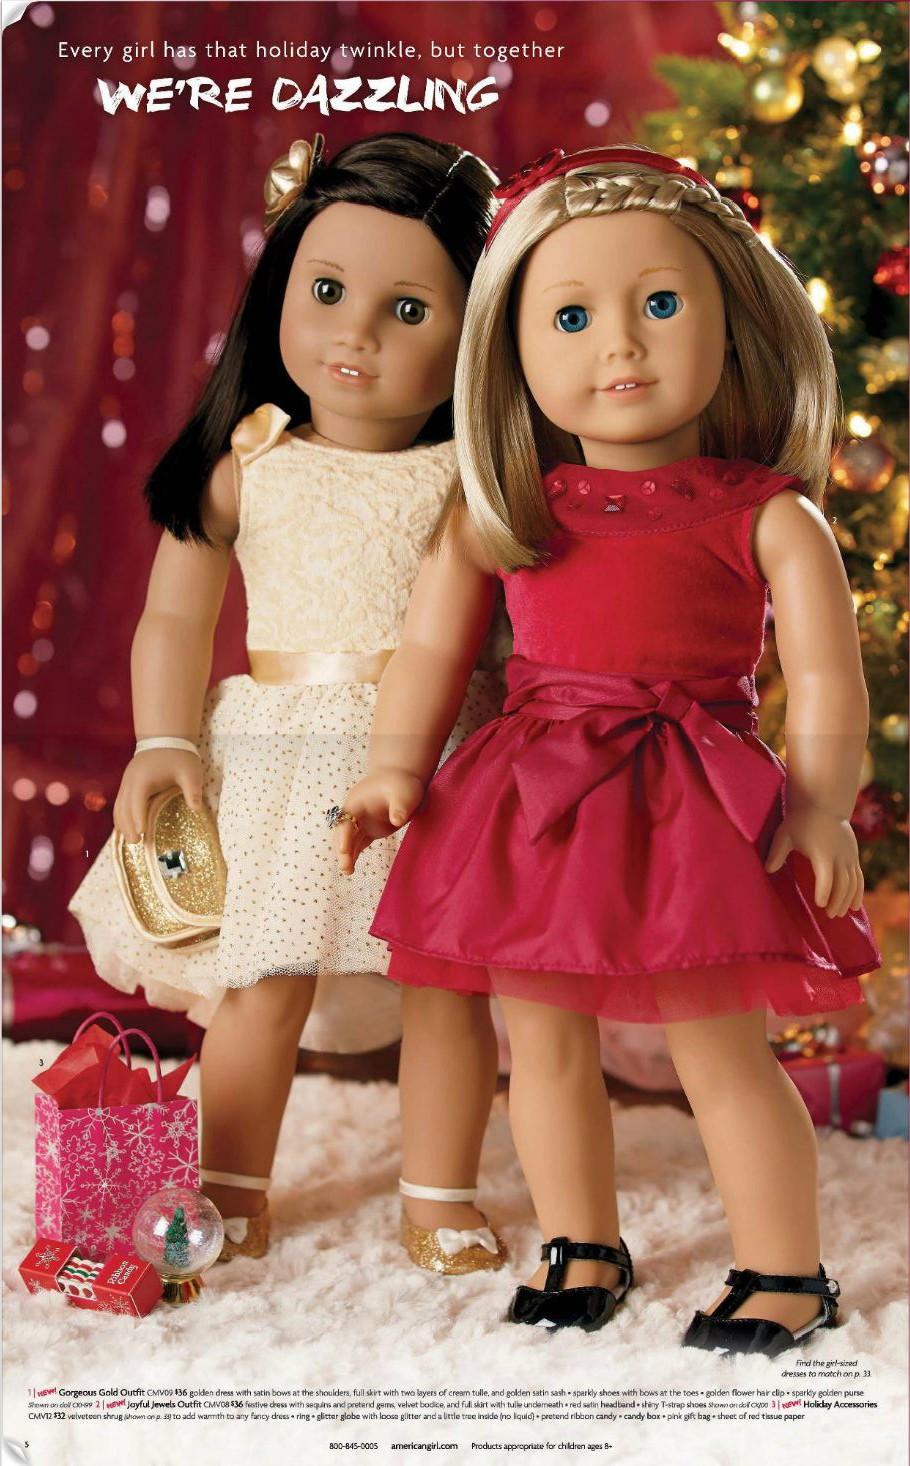 American Girl Holiday Catalog Photos 2015 Small Dolls